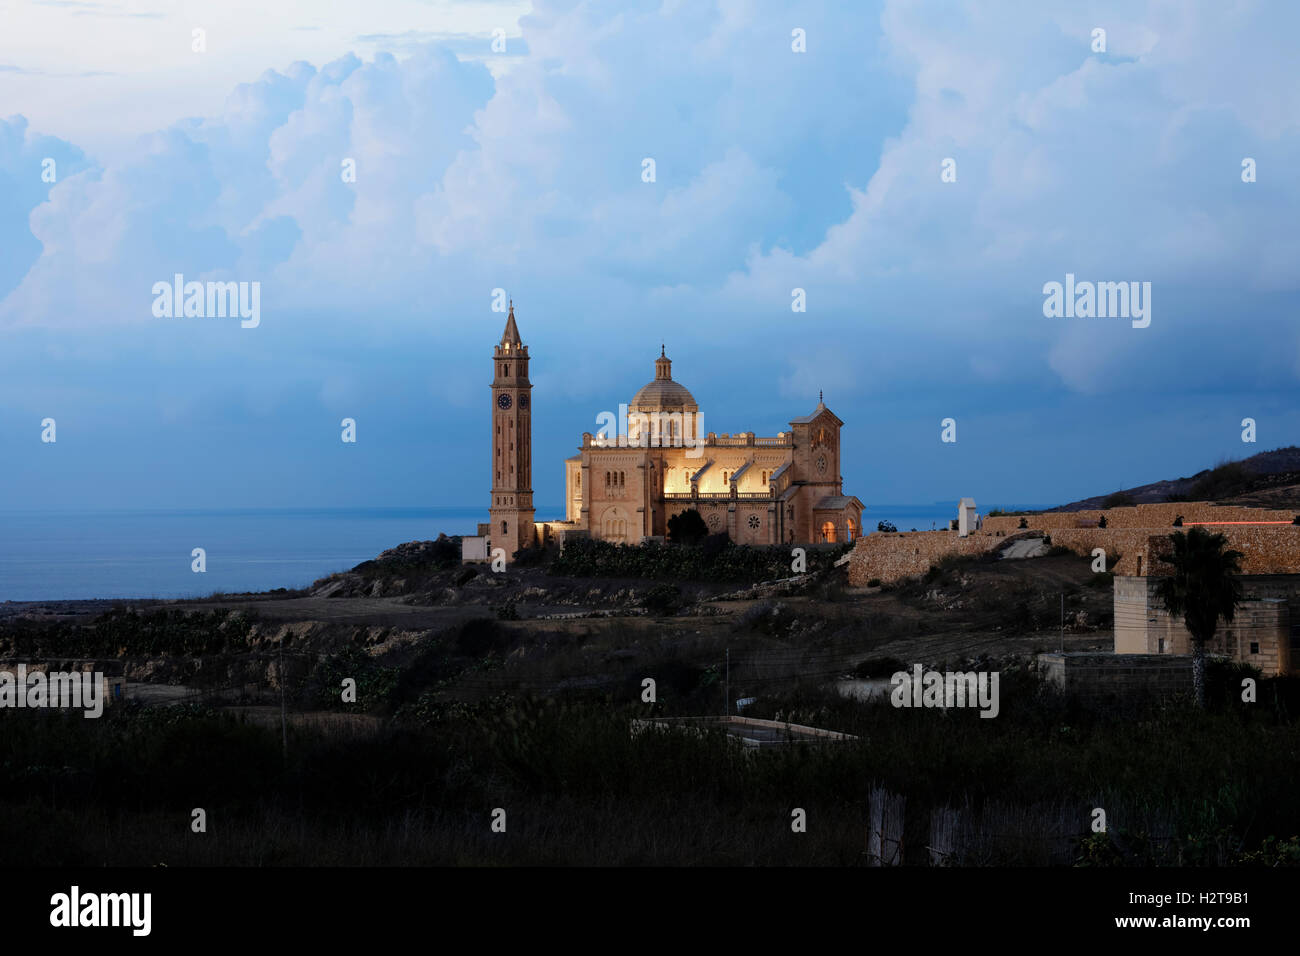 Basilica Ta Pinu, Gharb, Gozo, Malta - Stock Image